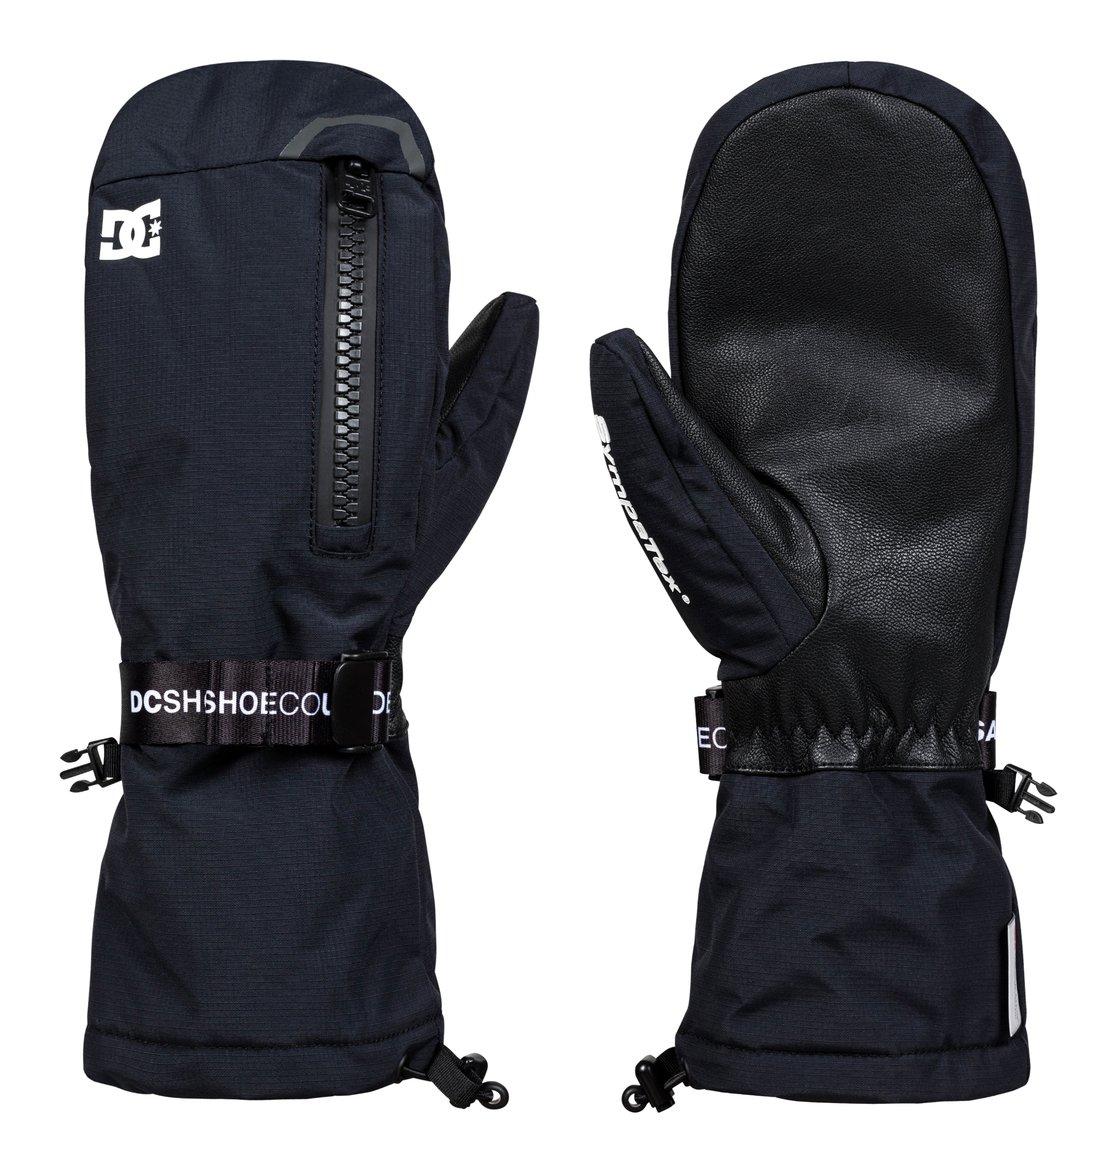 DC Shoes Snowboardhandschuhe Legion   Accessoires > Handschuhe > Sonstige Handschuhe   Dc Shoes